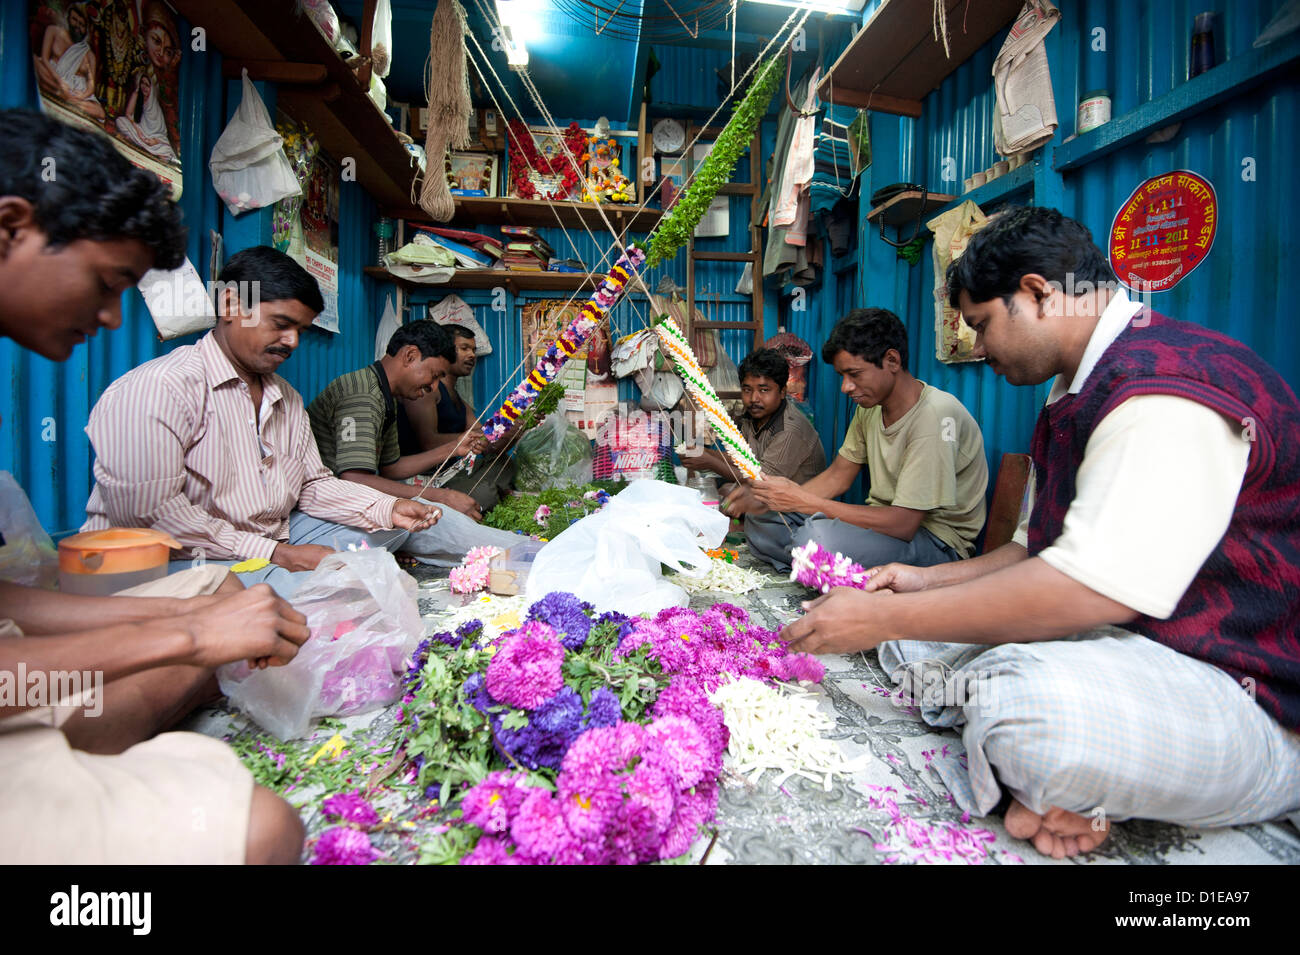 Mala makers (garland makers) at work in Kolkata's morning flower market, Howrah, Kolkata, West Bengal, India, - Stock Image